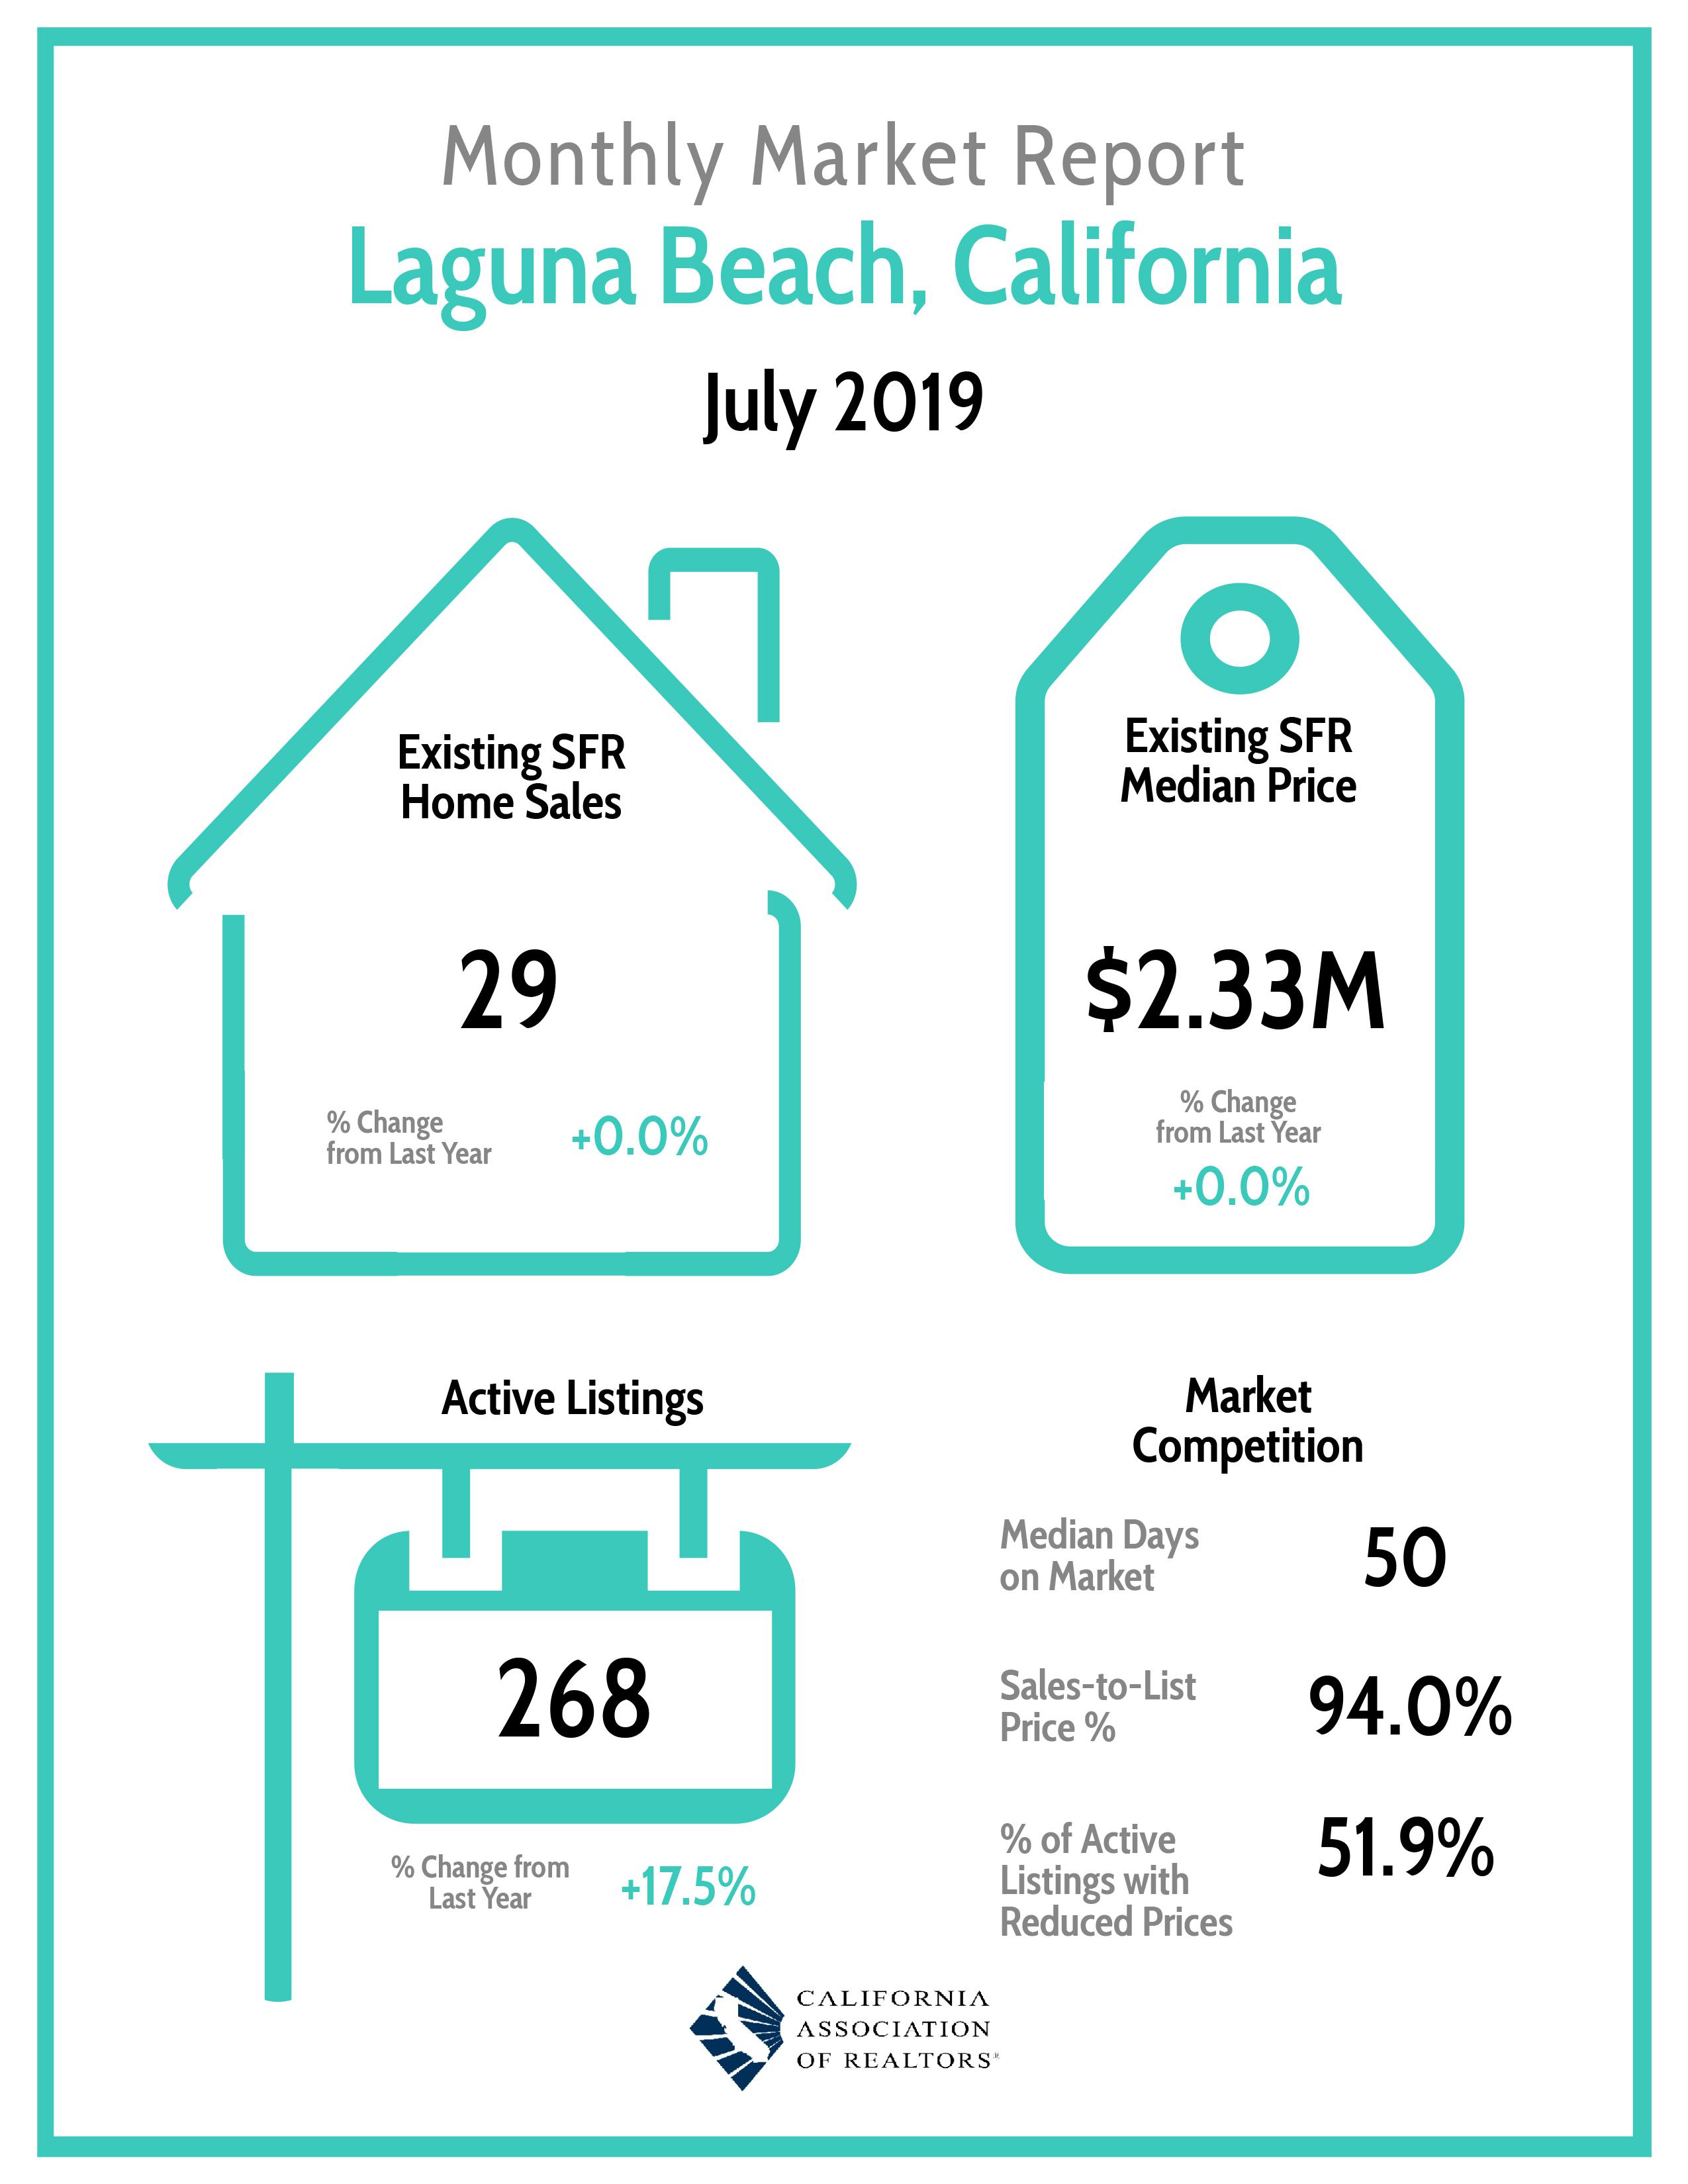 Monthly Market Report LAGUNA Beach July 2019